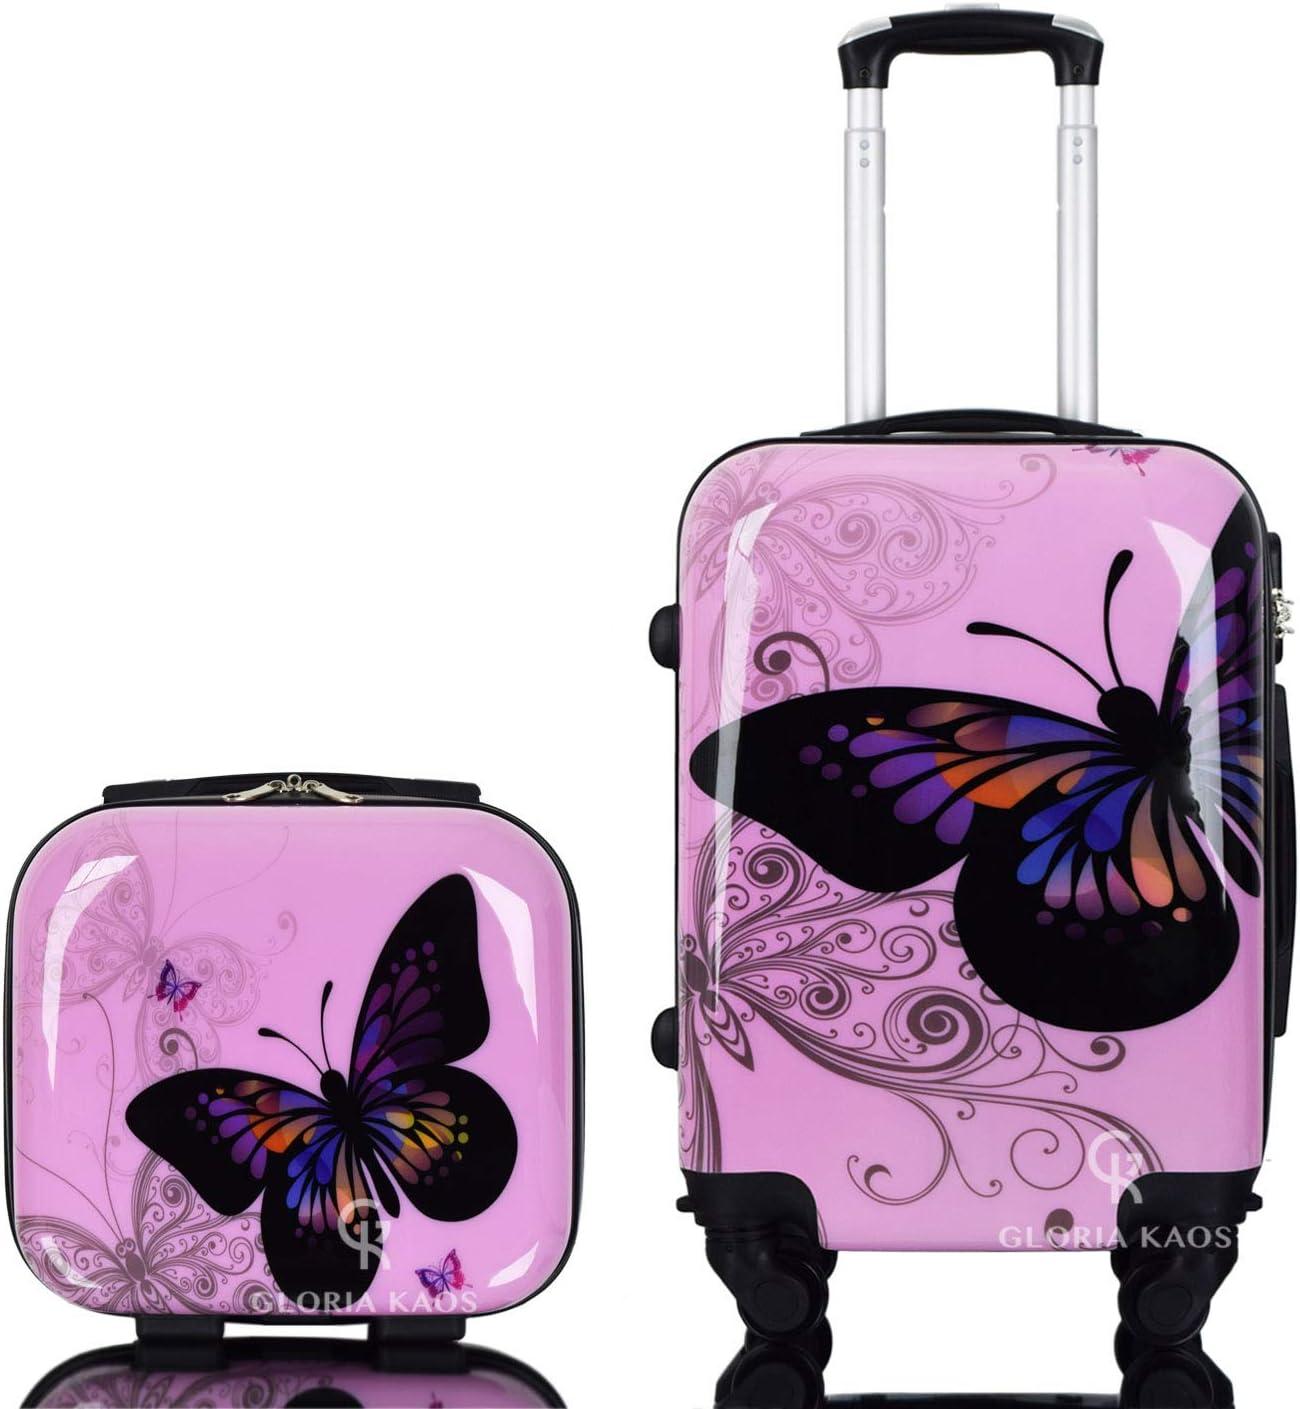 Gloria Kaos - Set bis - Maleta de Policarbonato Flexible Ultraligera para Equipaje de Mano (Mariposa Rosa 50cm + Vanity Case)